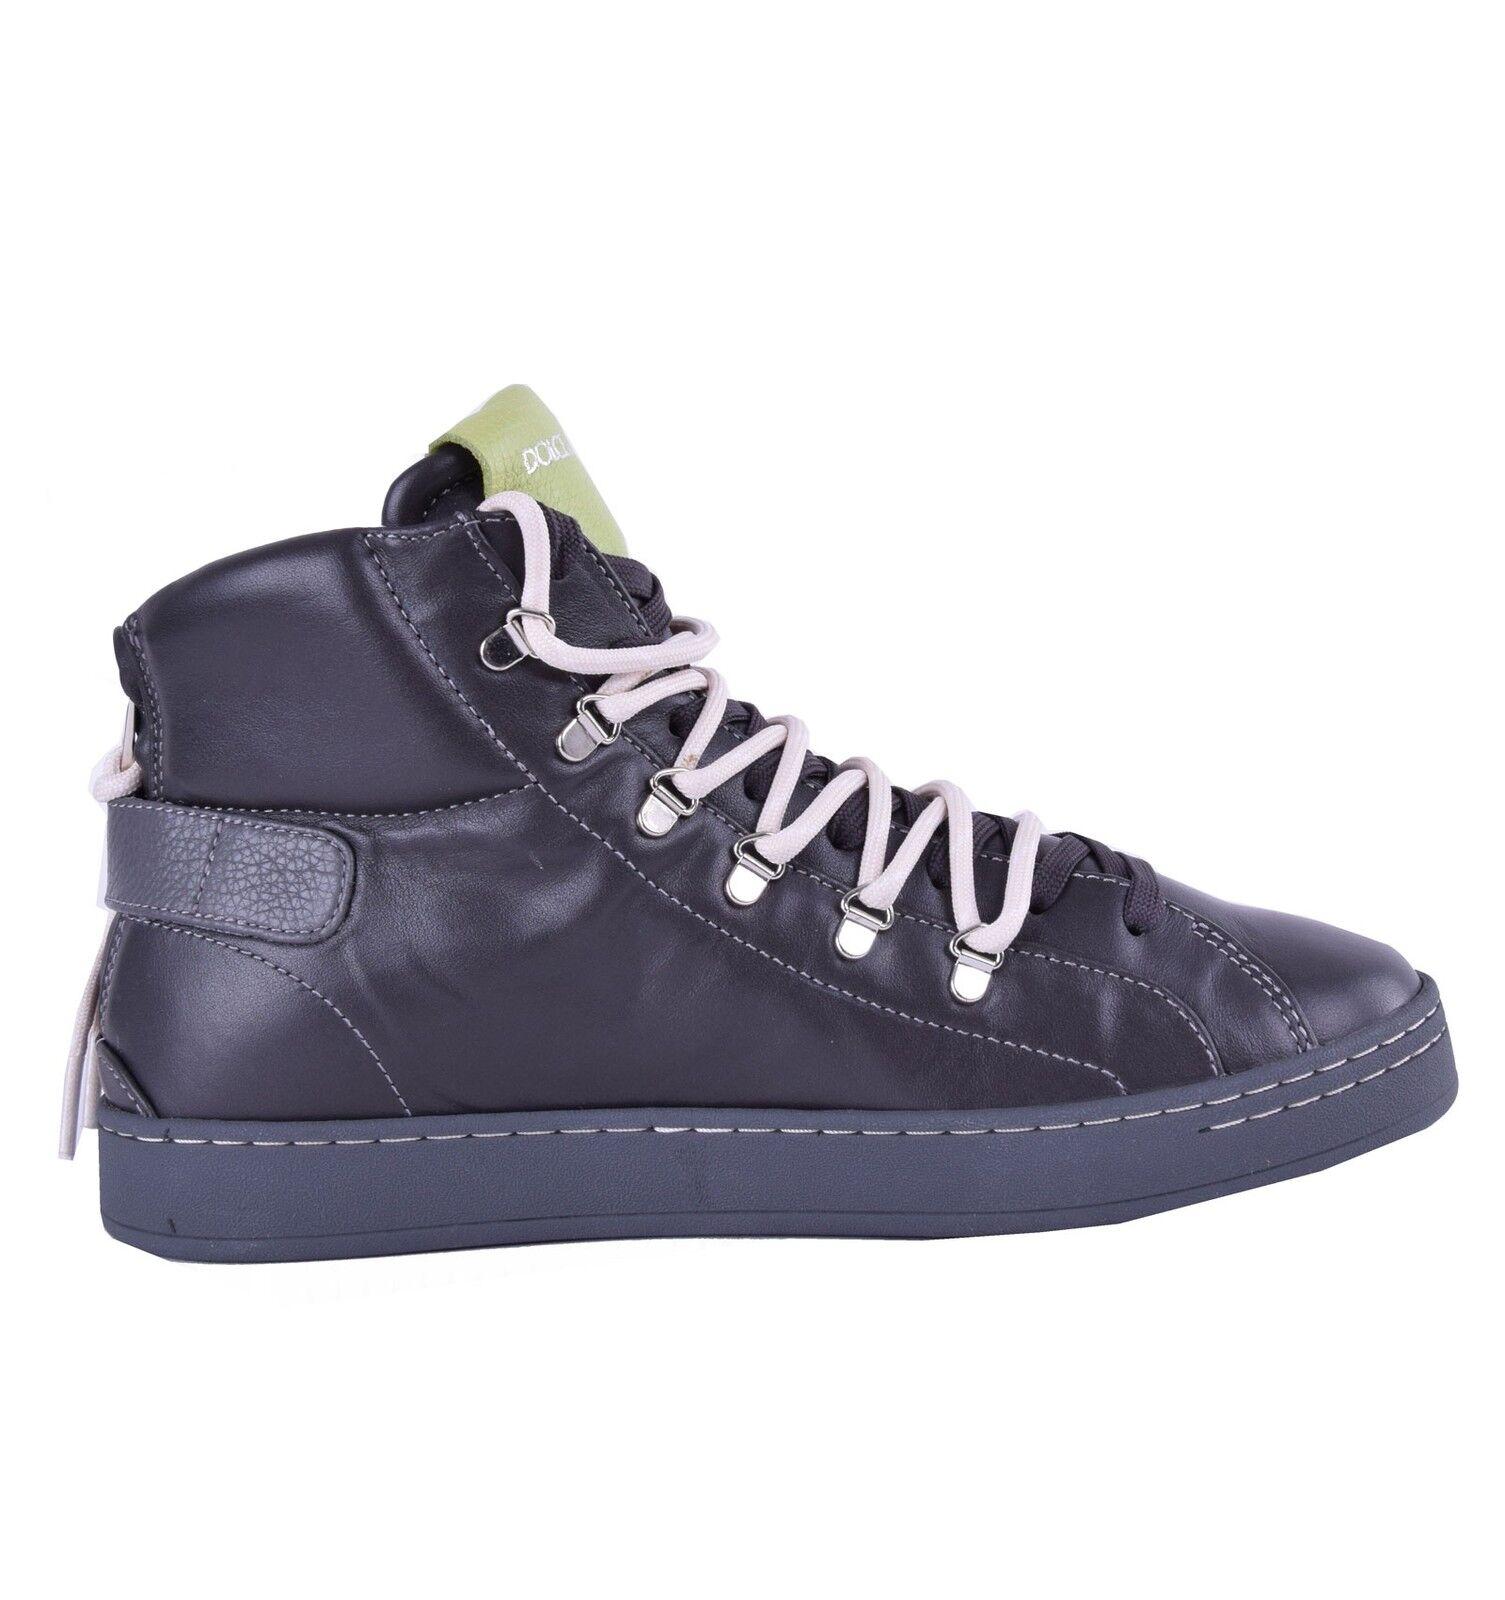 brand new 8341c 5ab28 NEW Nike iD Kobe 9 9 9 Elite Flyknit Mamba Moment SZ 11 Multicolor KB24  Jordan ...